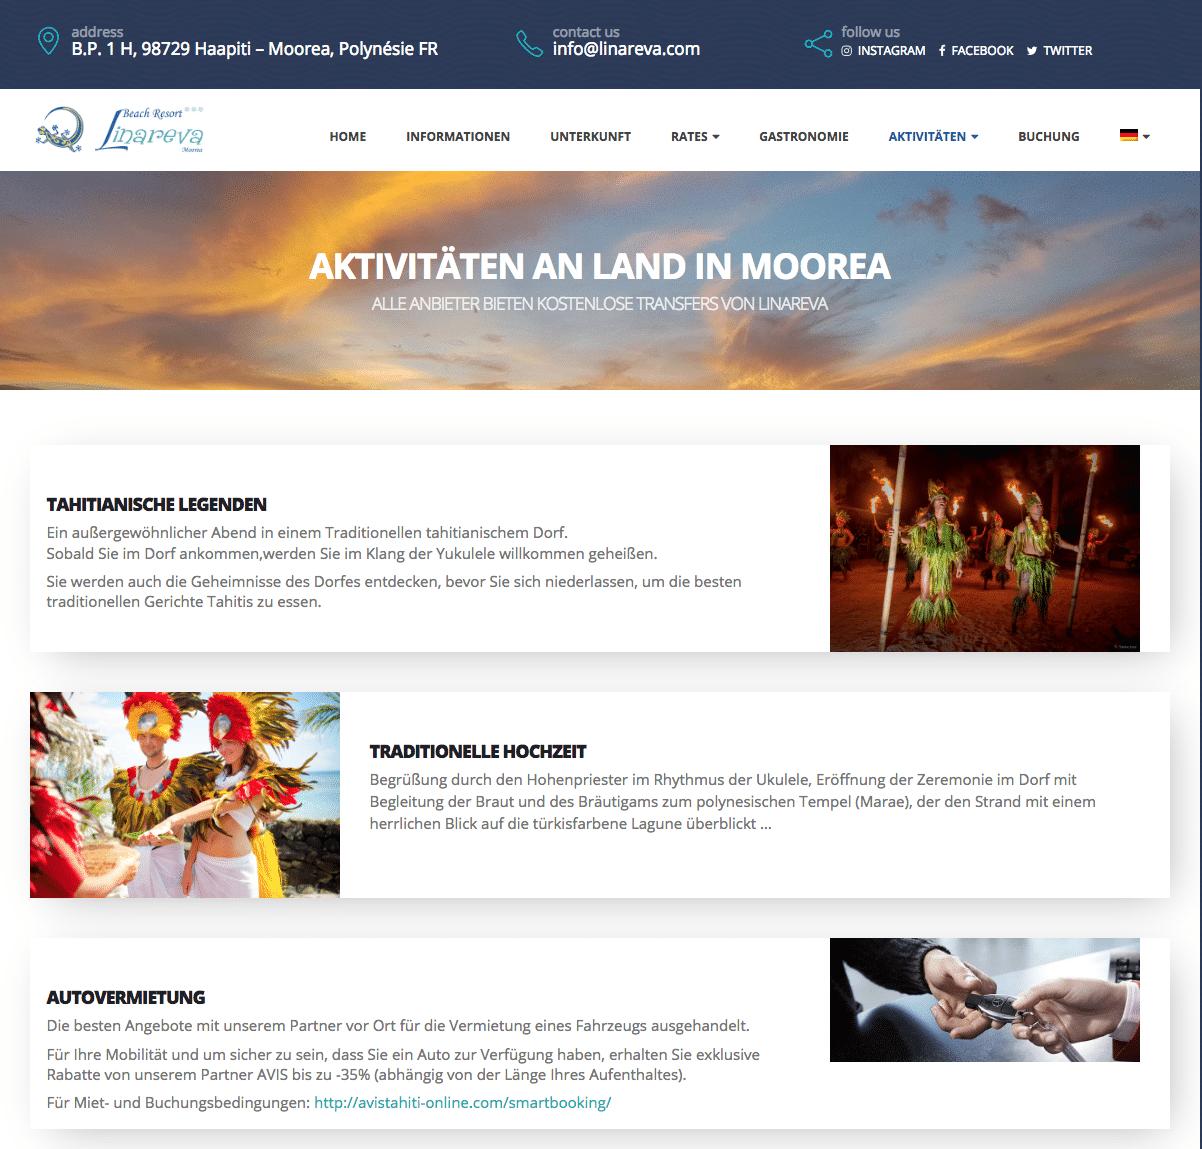 Linareva Moorea Polynésie version Allemande, une création karedess, agence web de Mulhouse